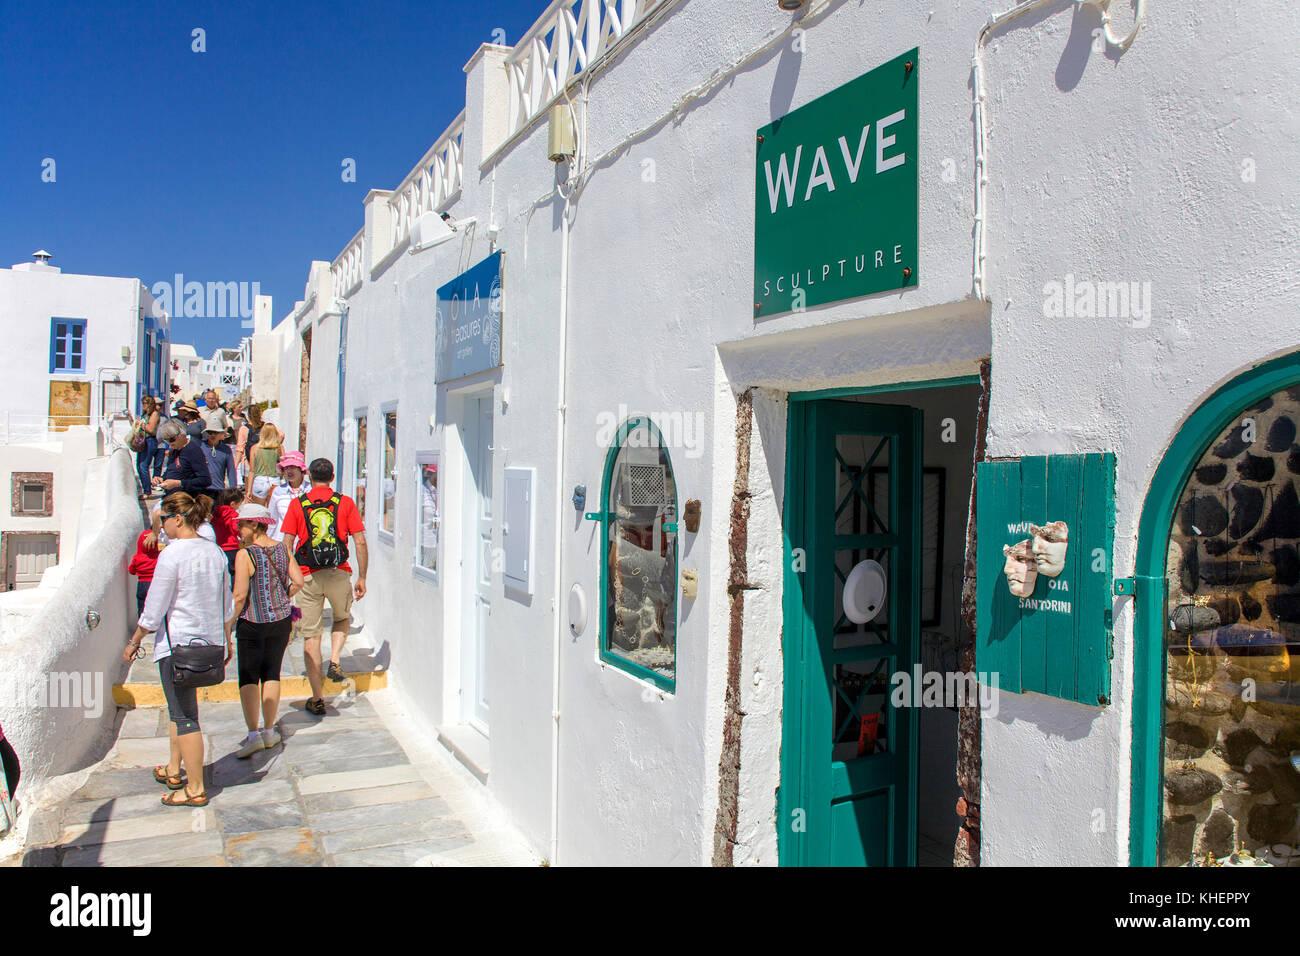 Souvenir shops at along the crater edge path, Oia, Santorin island, Cyclades, Aegean, Greece - Stock Image